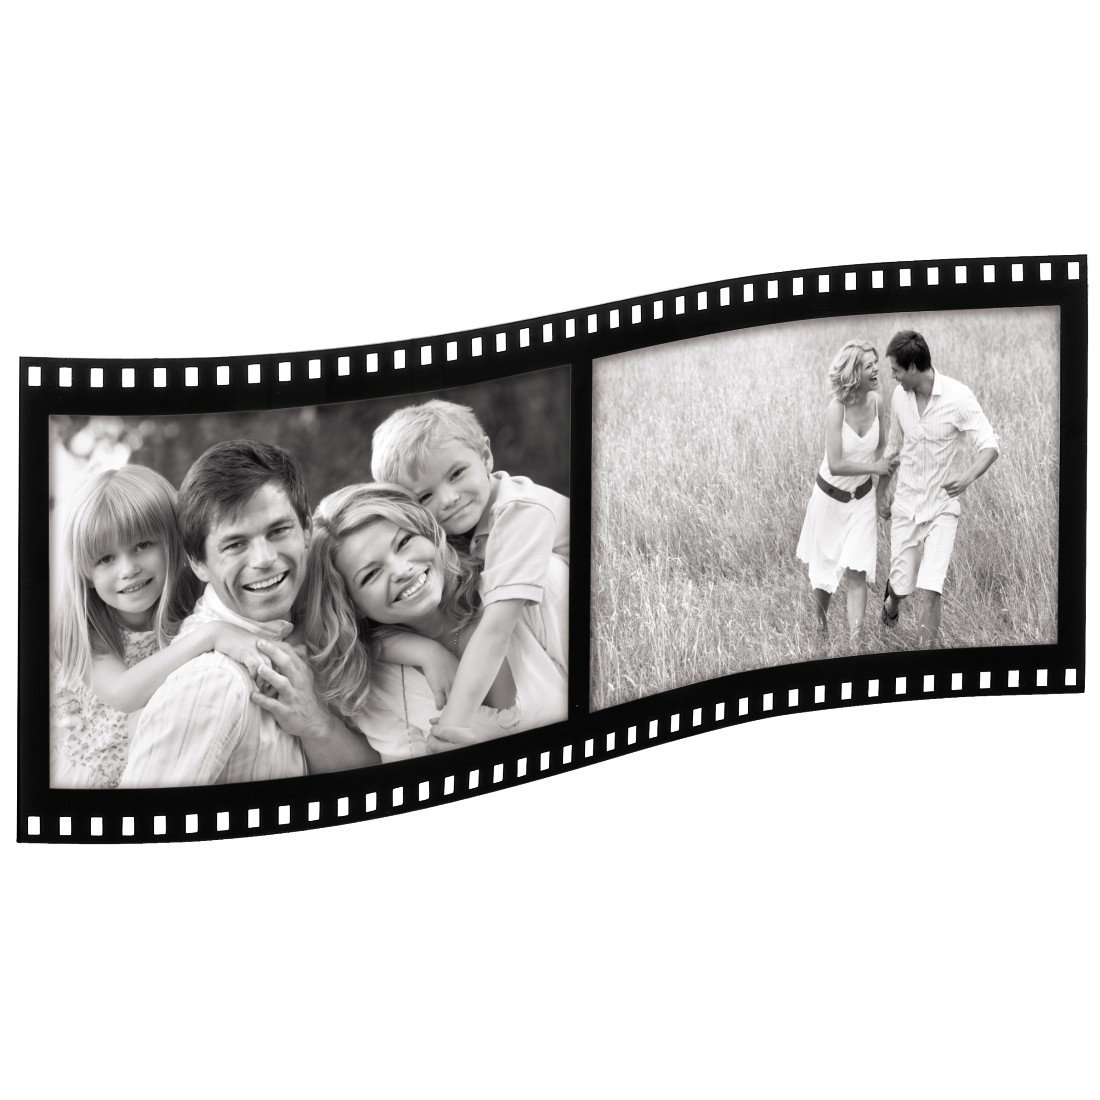 Amazon.de: Hama Portraitrahmen Filmstrip, Acryl, 10 x 15 cm